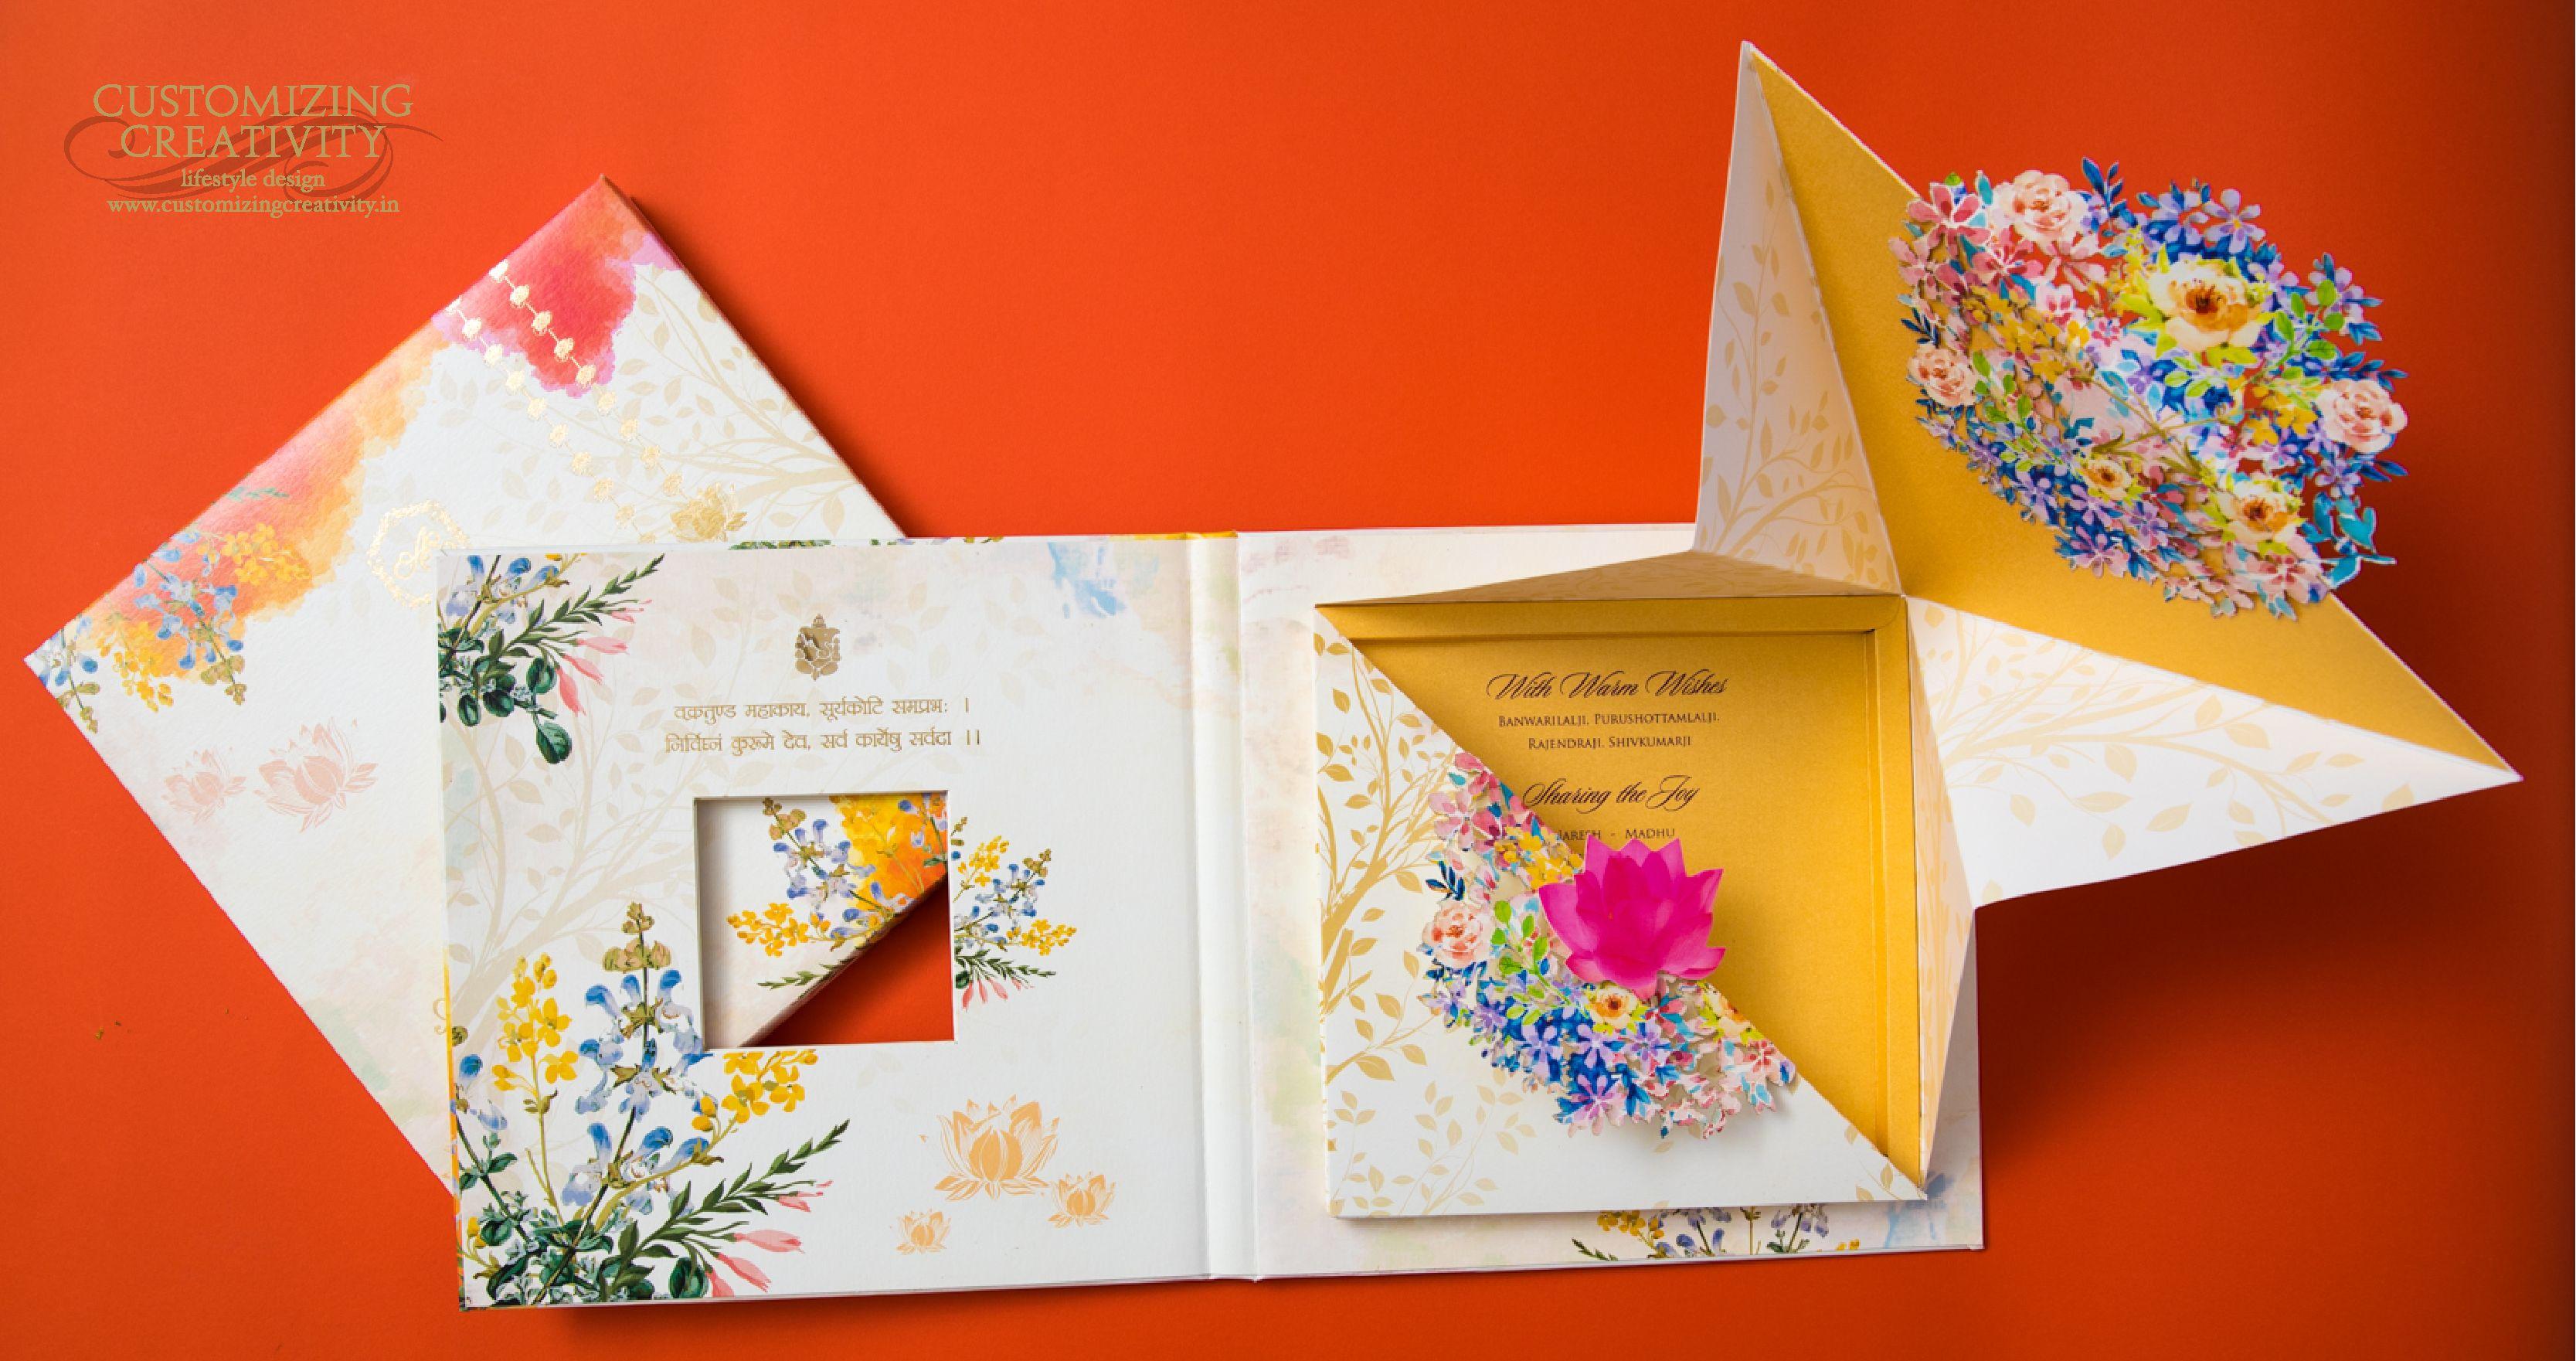 Wedding Invitation Cards Indian Wedding Cards Invites Wedding Stationery Customized Invitation Indian Wedding Cards Wedding Cards Cheap Wedding Invitations